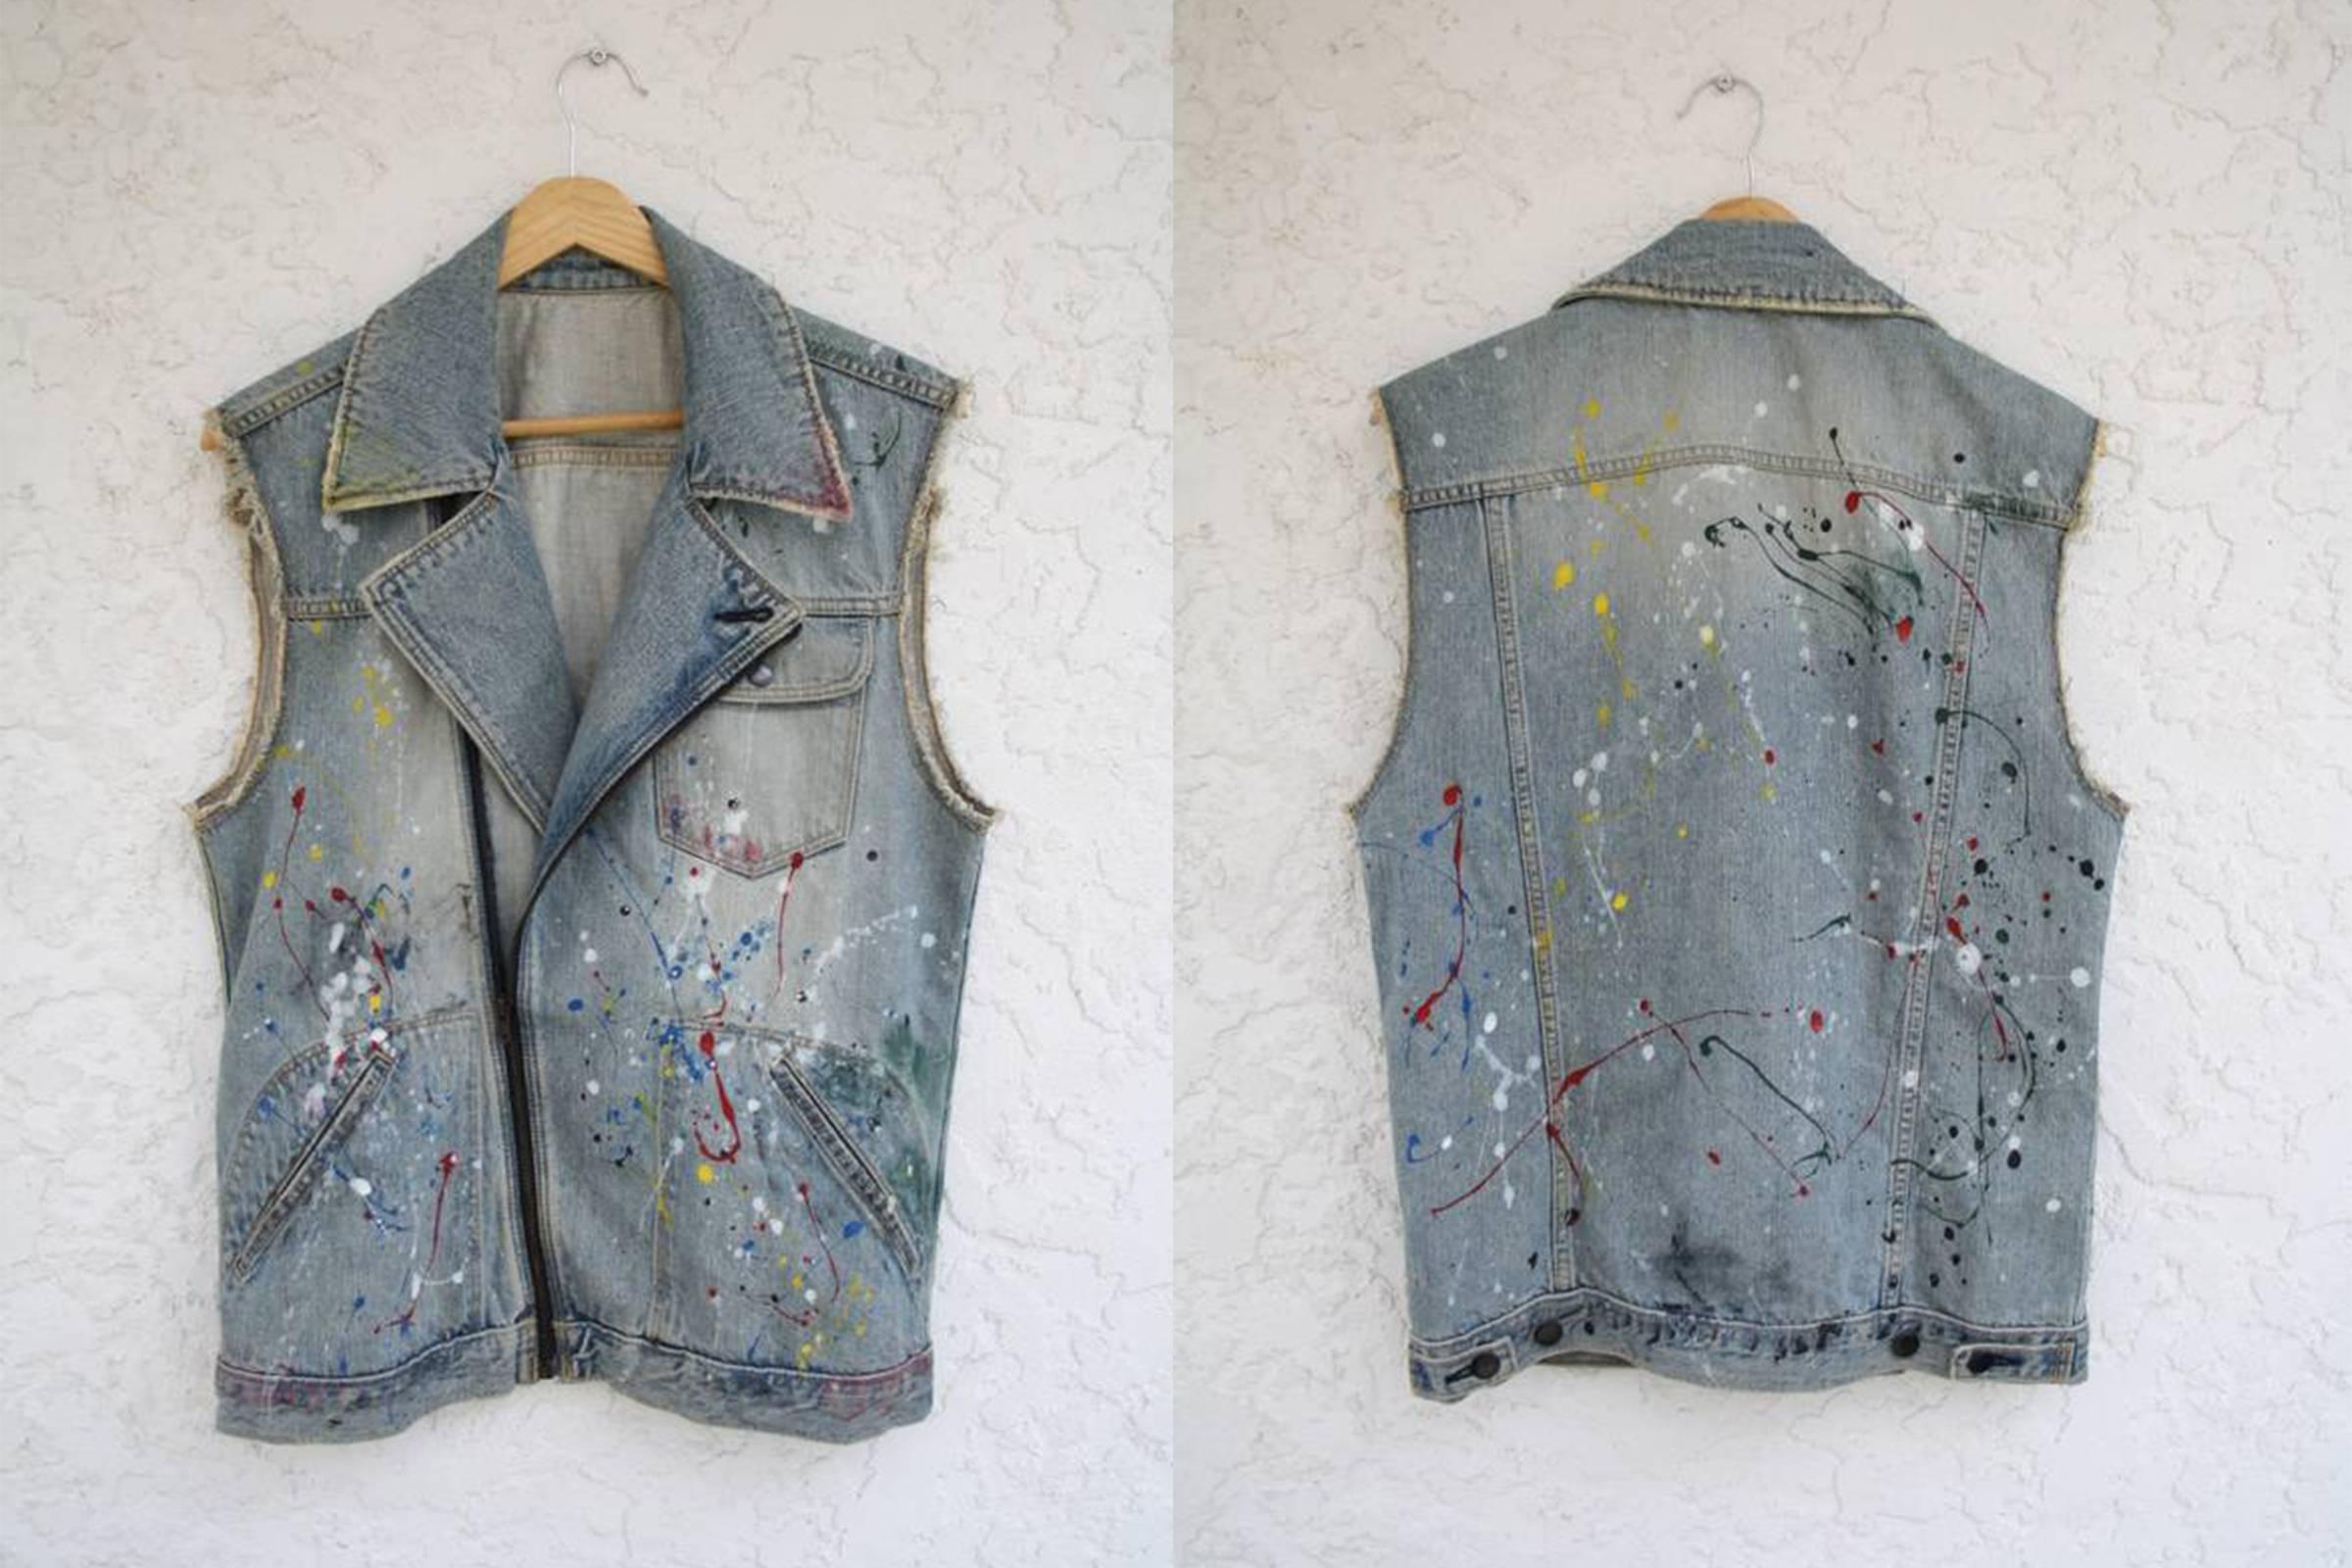 Number (N)ine Paint Splatter Denim Sleeveless Perfecto, from the wardrobe of Levi Verschuur